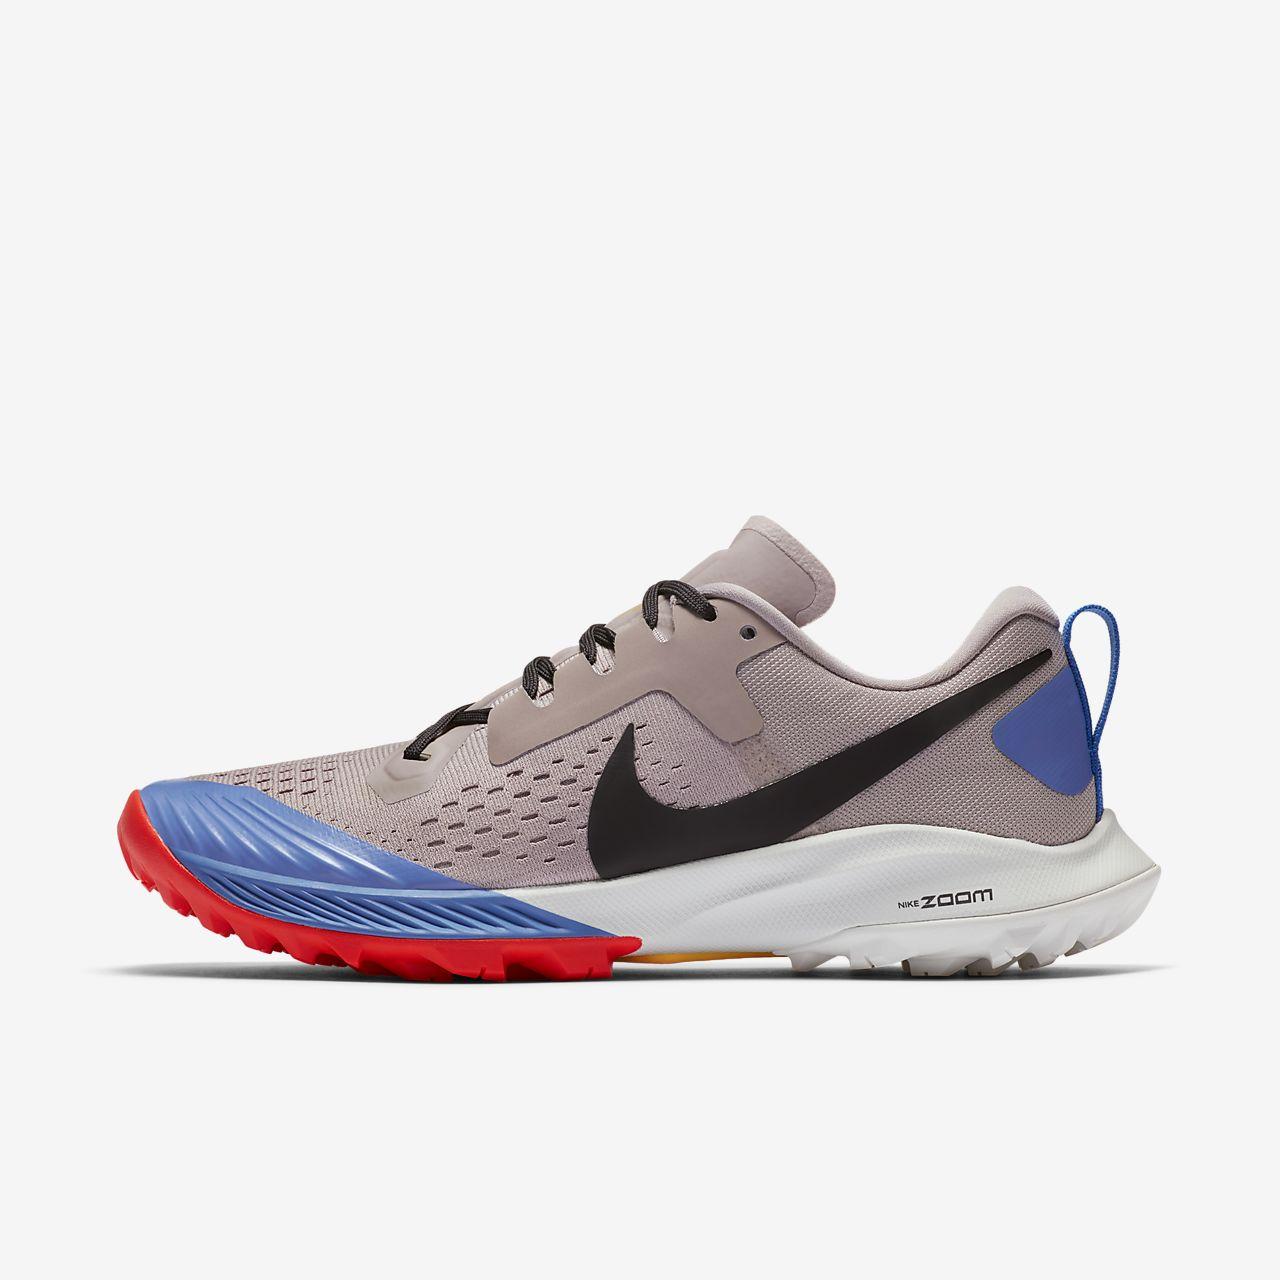 Nike Air Zoom Terra Kiger 5 Women's Trail Running Shoe